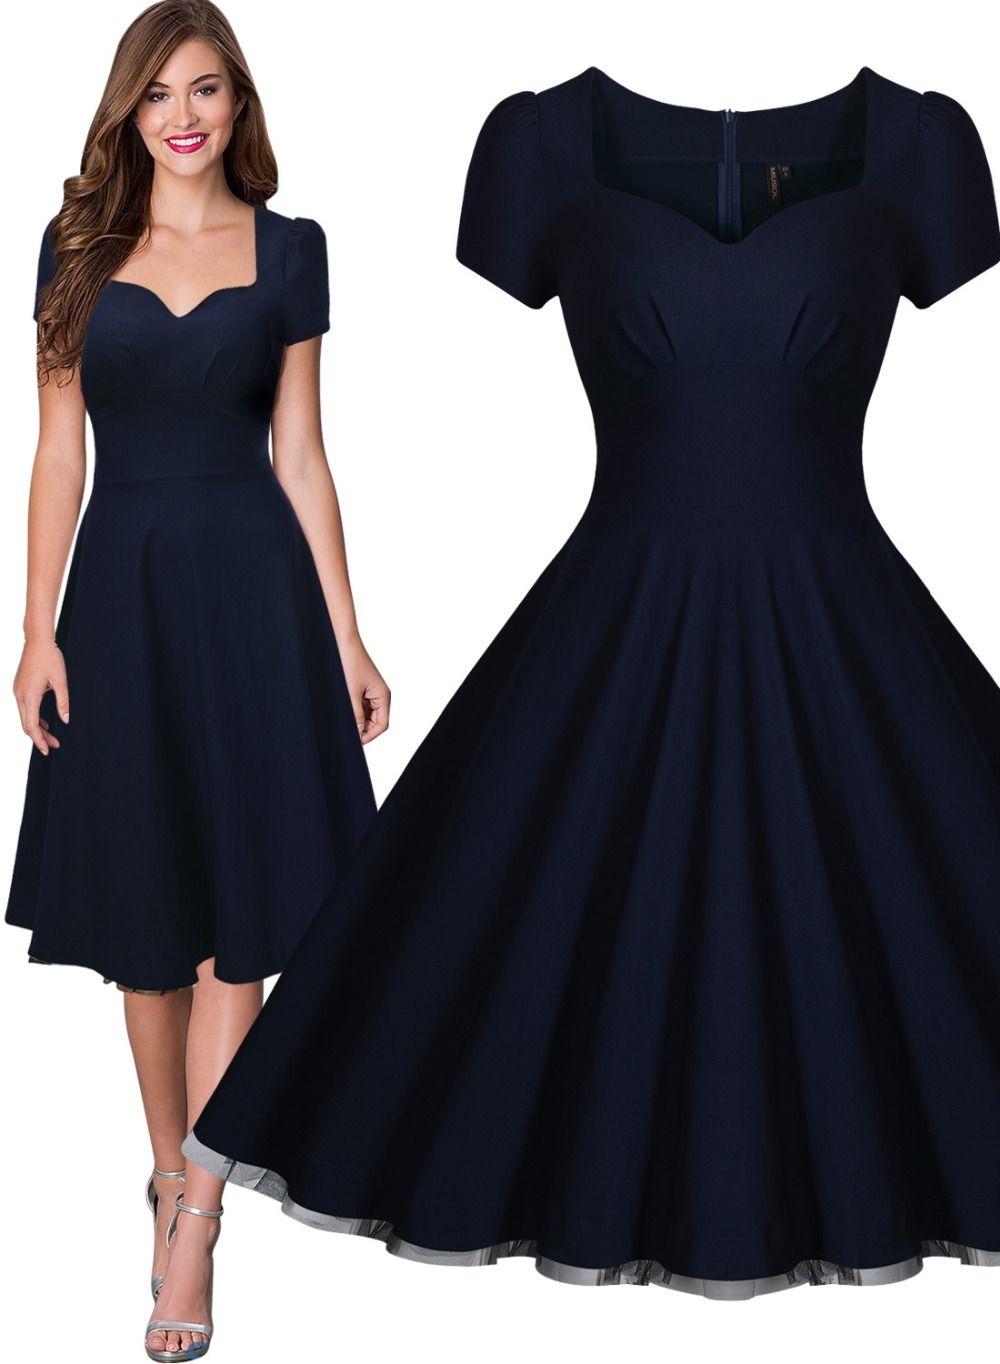 25a4934b39b14 Free shipping Women's Vintage Style Retro 1940s Shirtwaist Flared ...